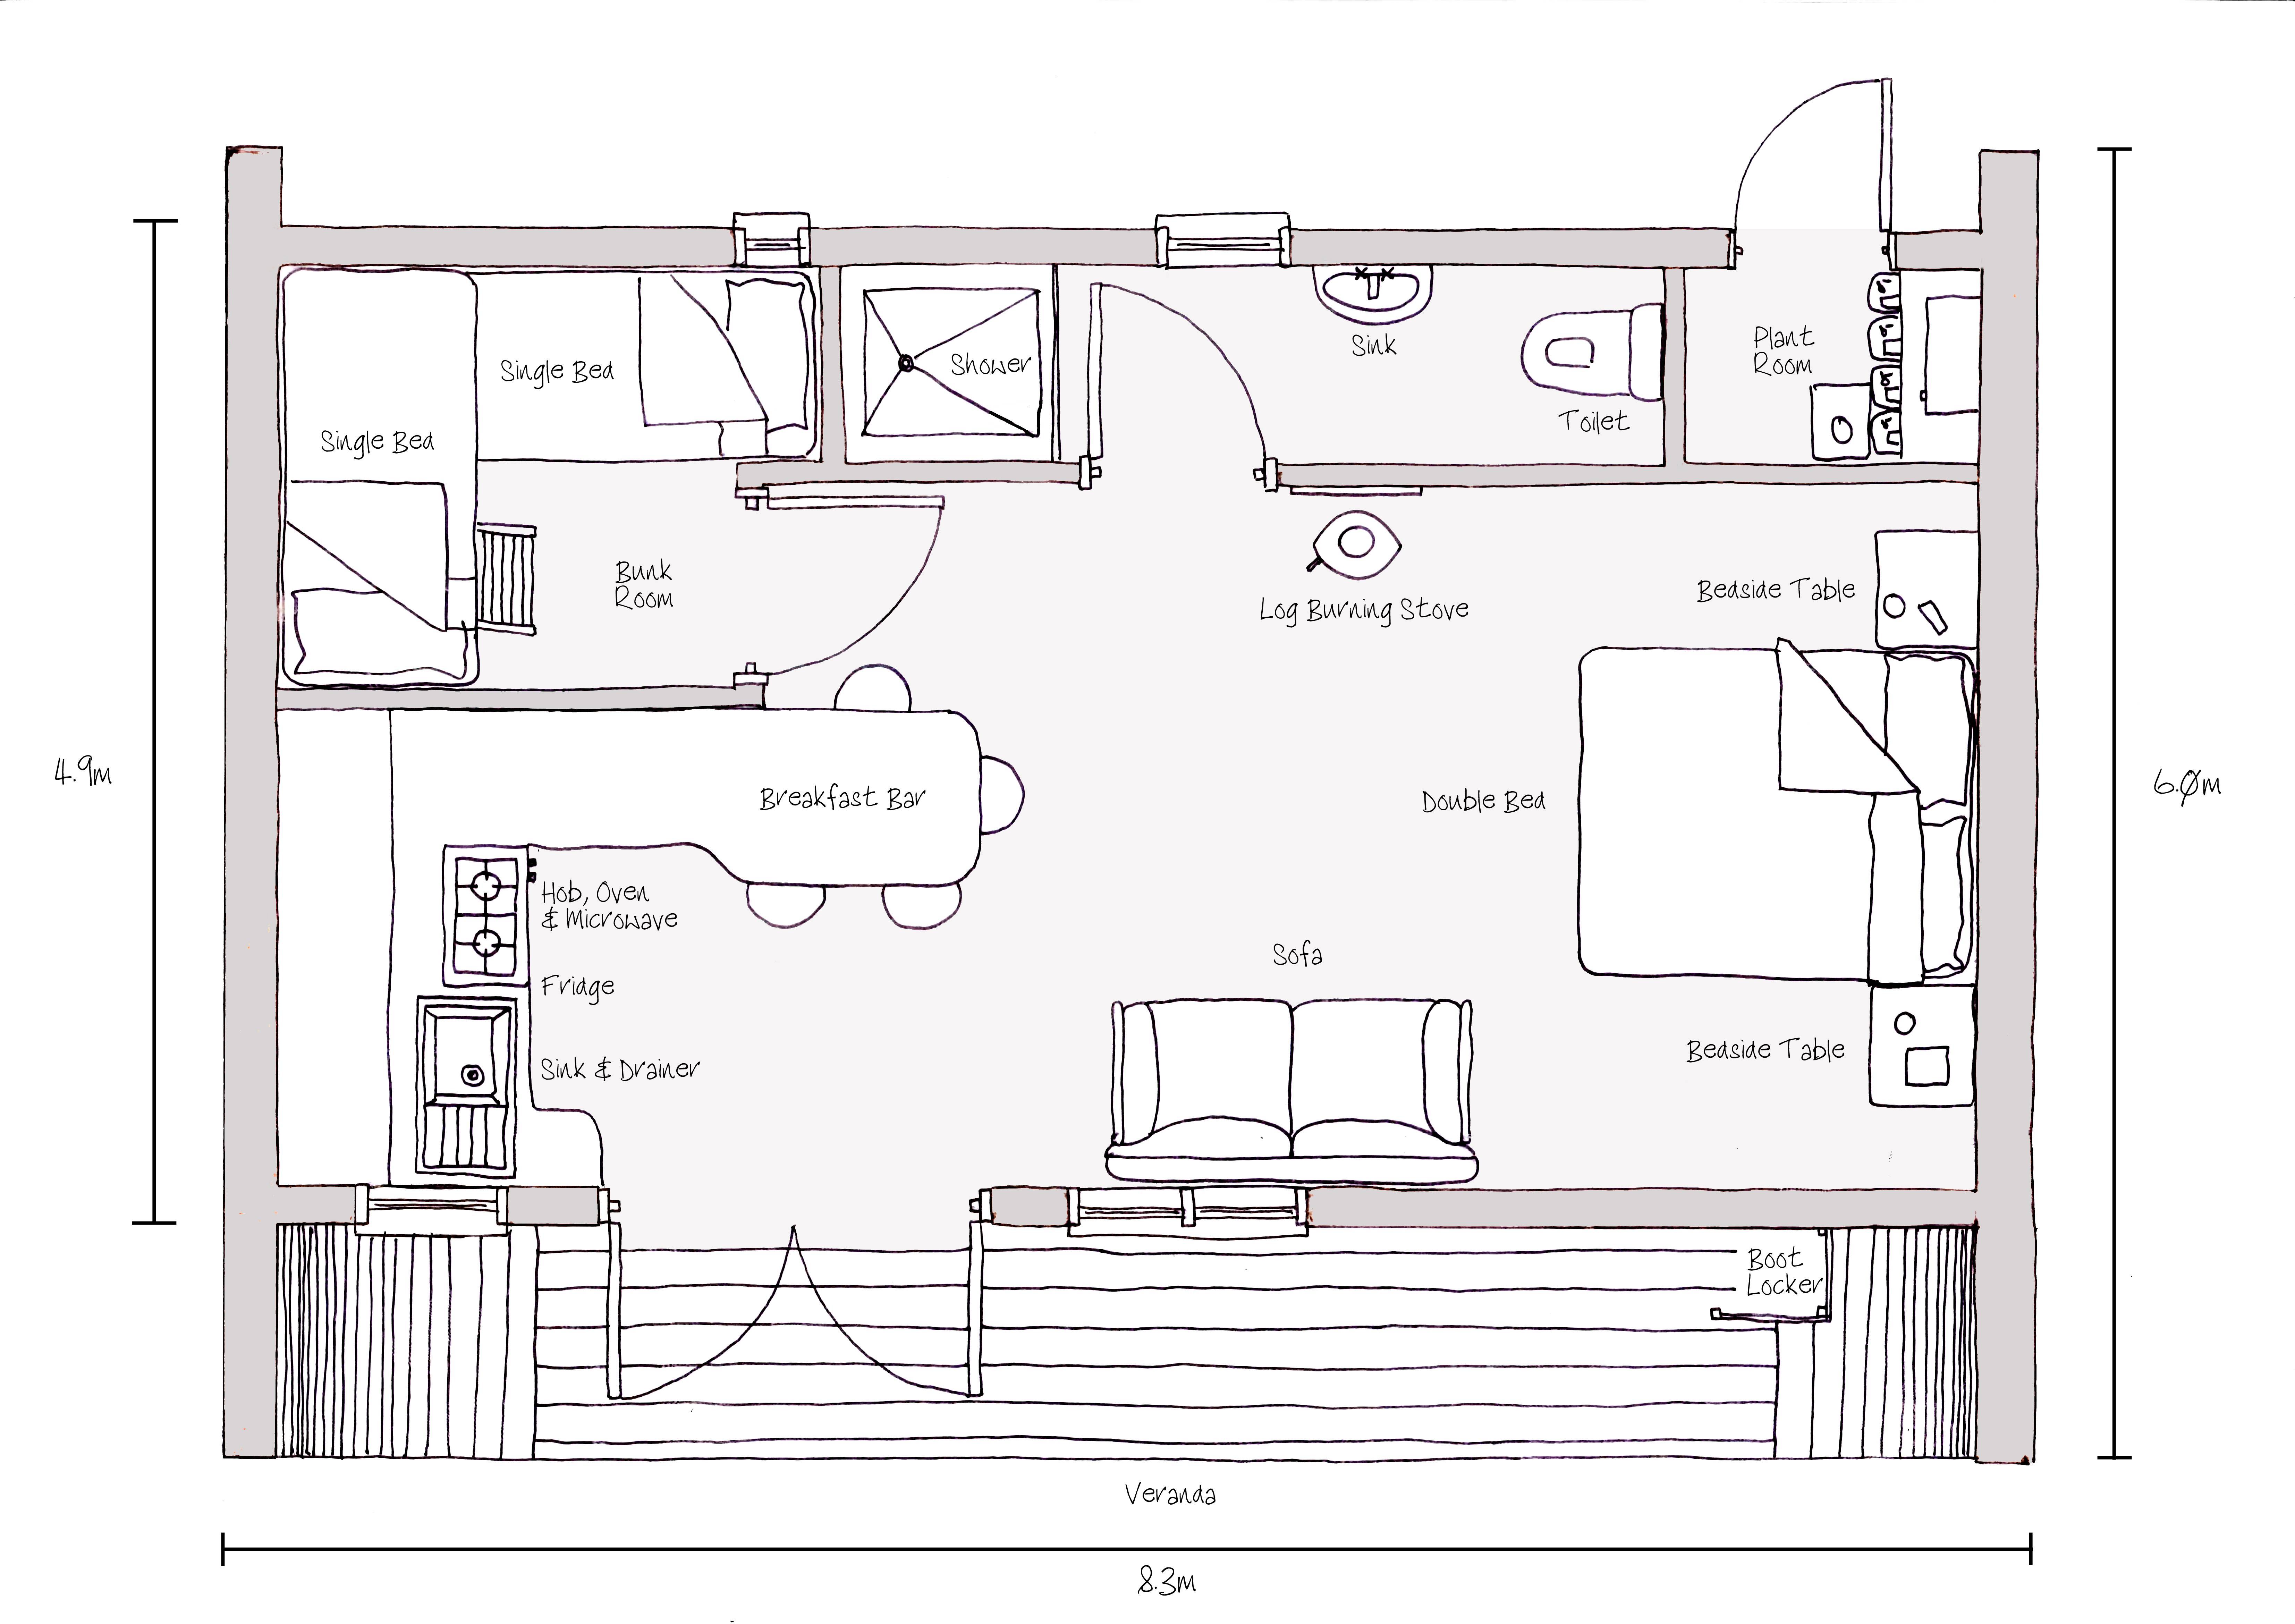 Interior Design Floor Plan Sketches home plan sketch. enter image description here. home plan sketch